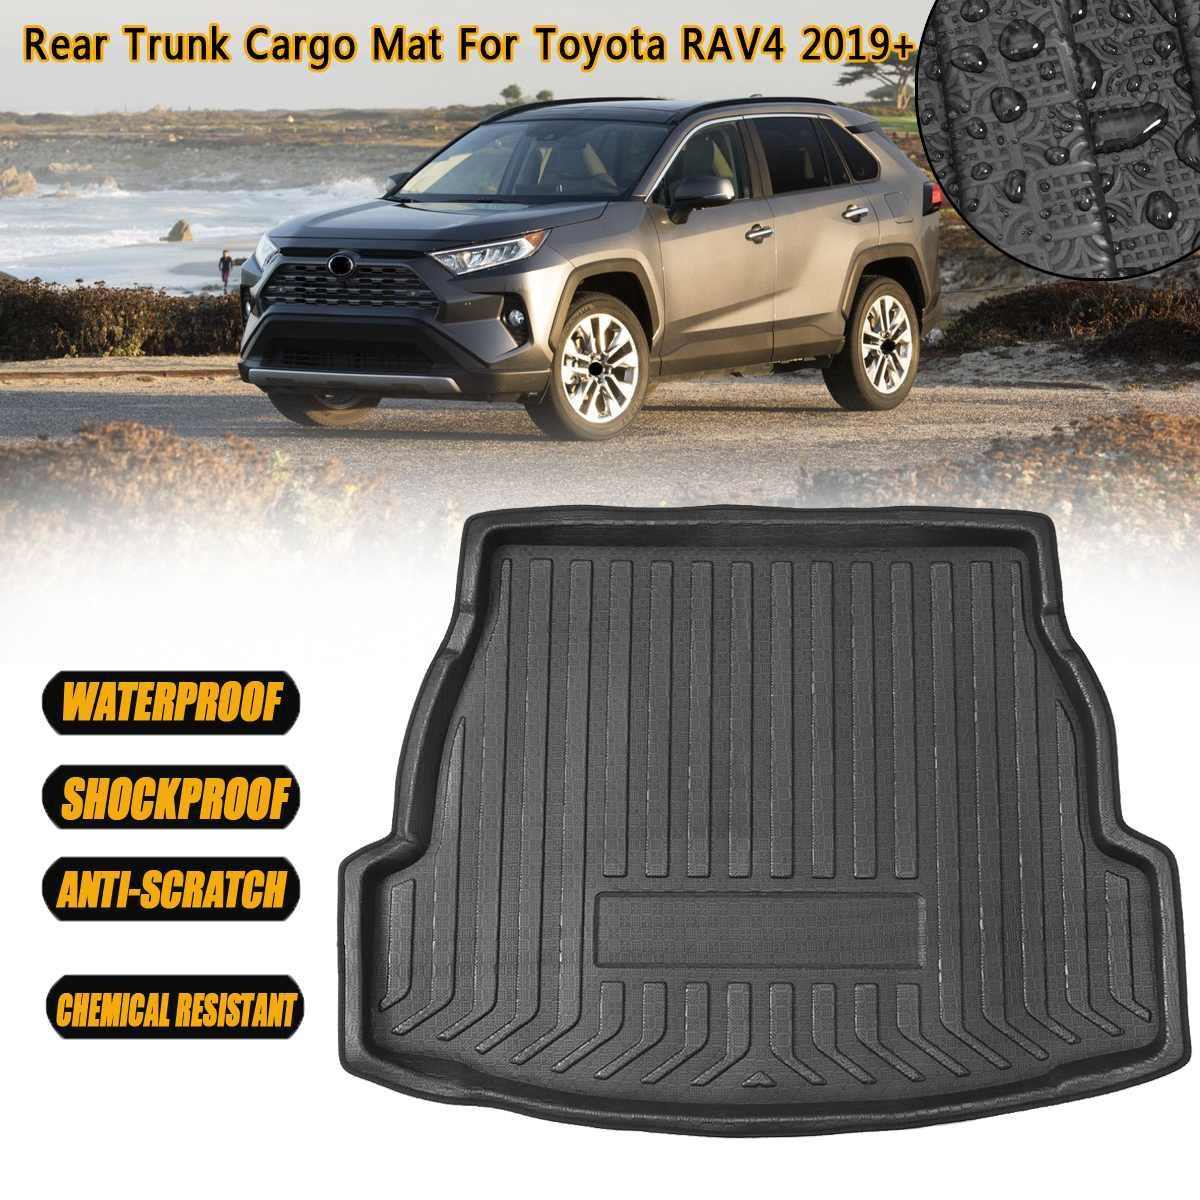 1pcs Black Color Car Boot Pad Carpet Trunk Cargo Liner Floor Mat Molded Cargo Tray Custom Fit For Toyota Highlander 2008 2009 2010 2011 2012 2013